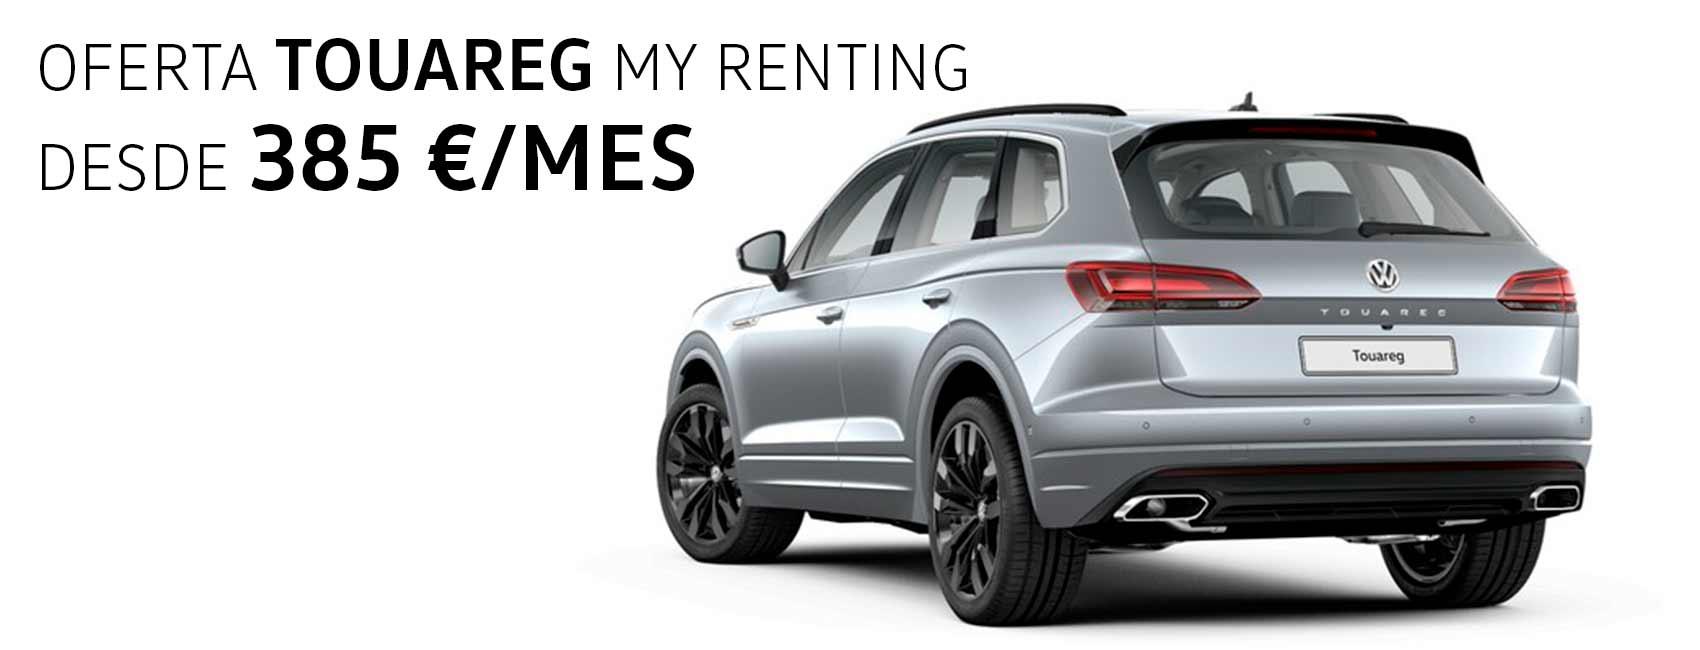 Volkswagen Touareg renting Zaragoza